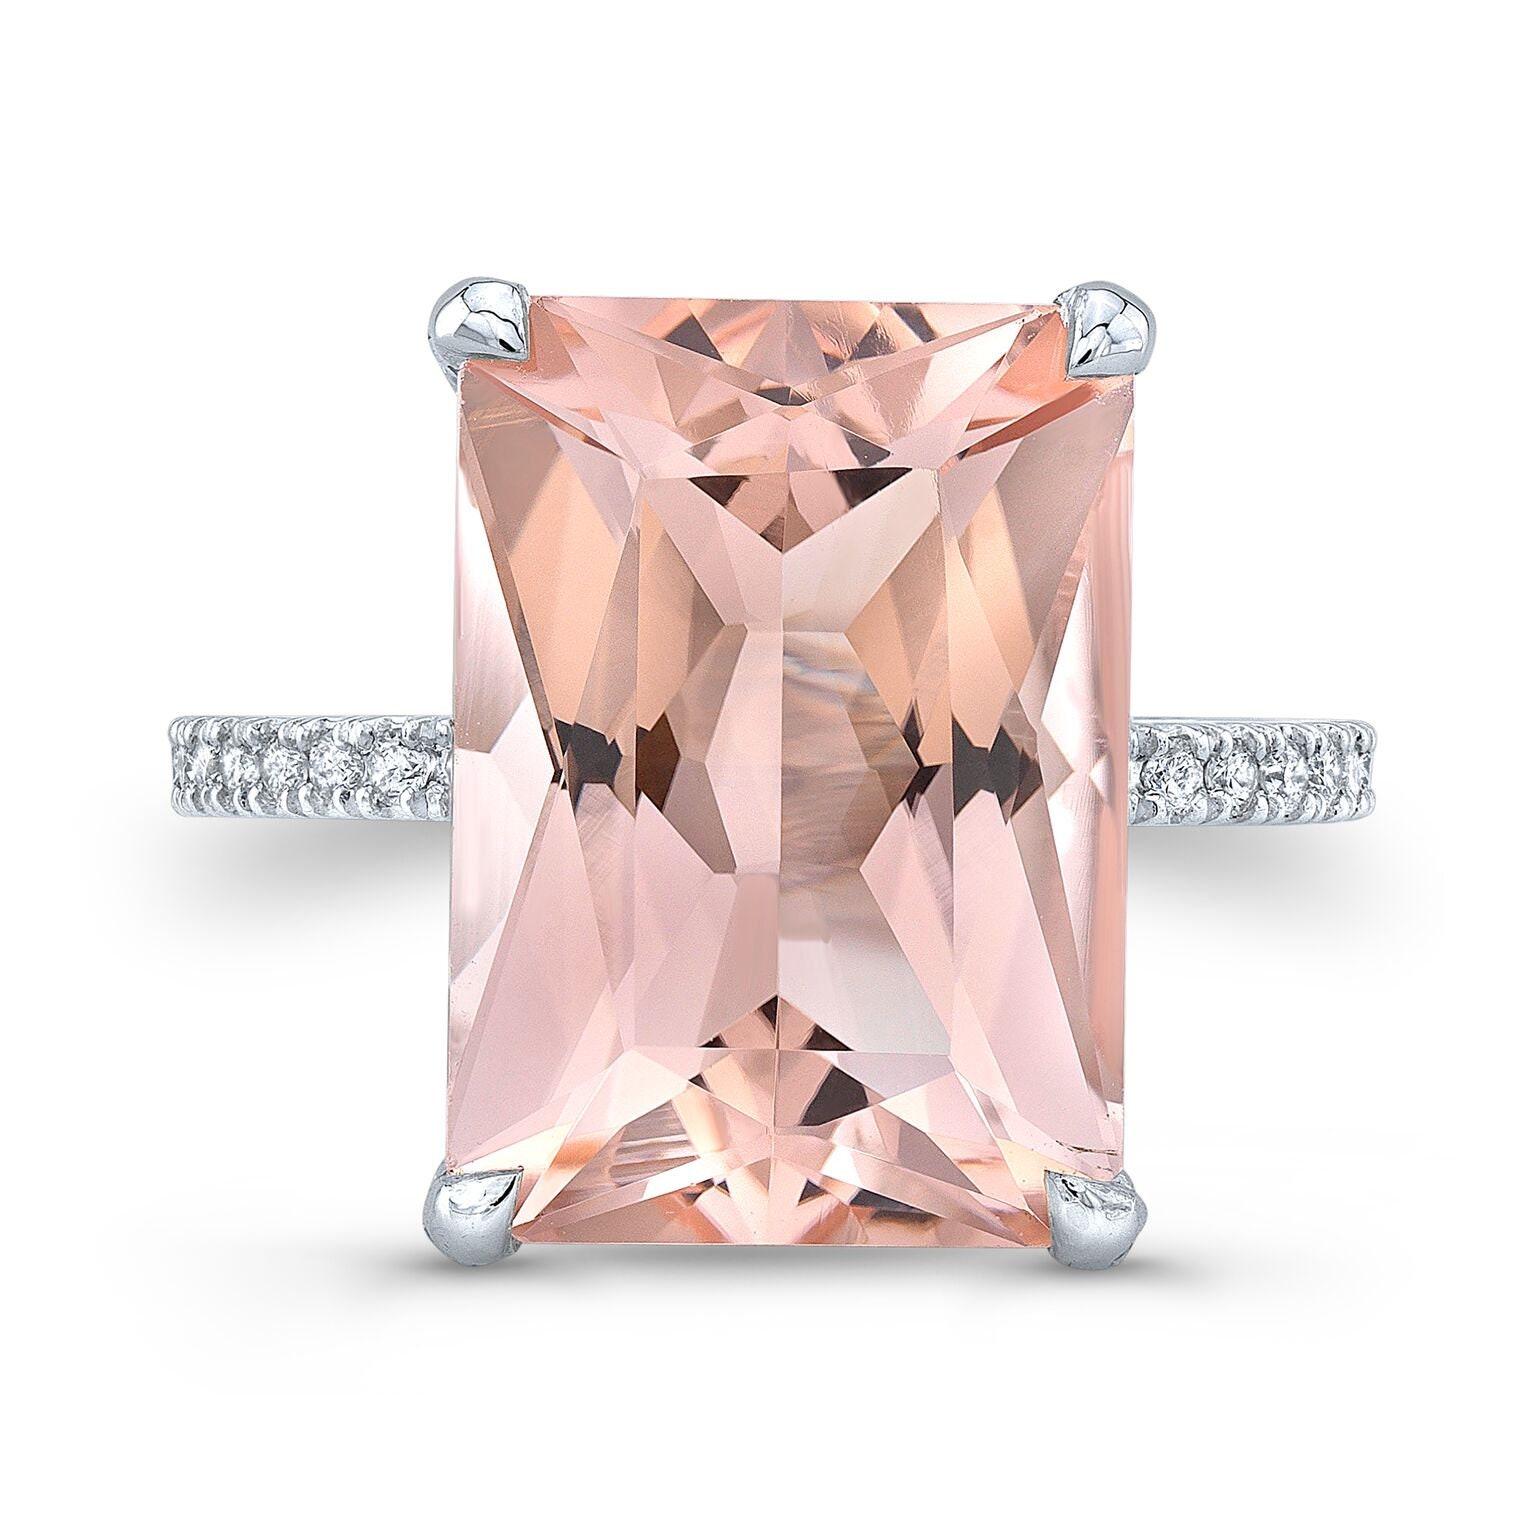 ADELE 6.00ct. Emerald Cut Morganite Engagement Ring   Etsy